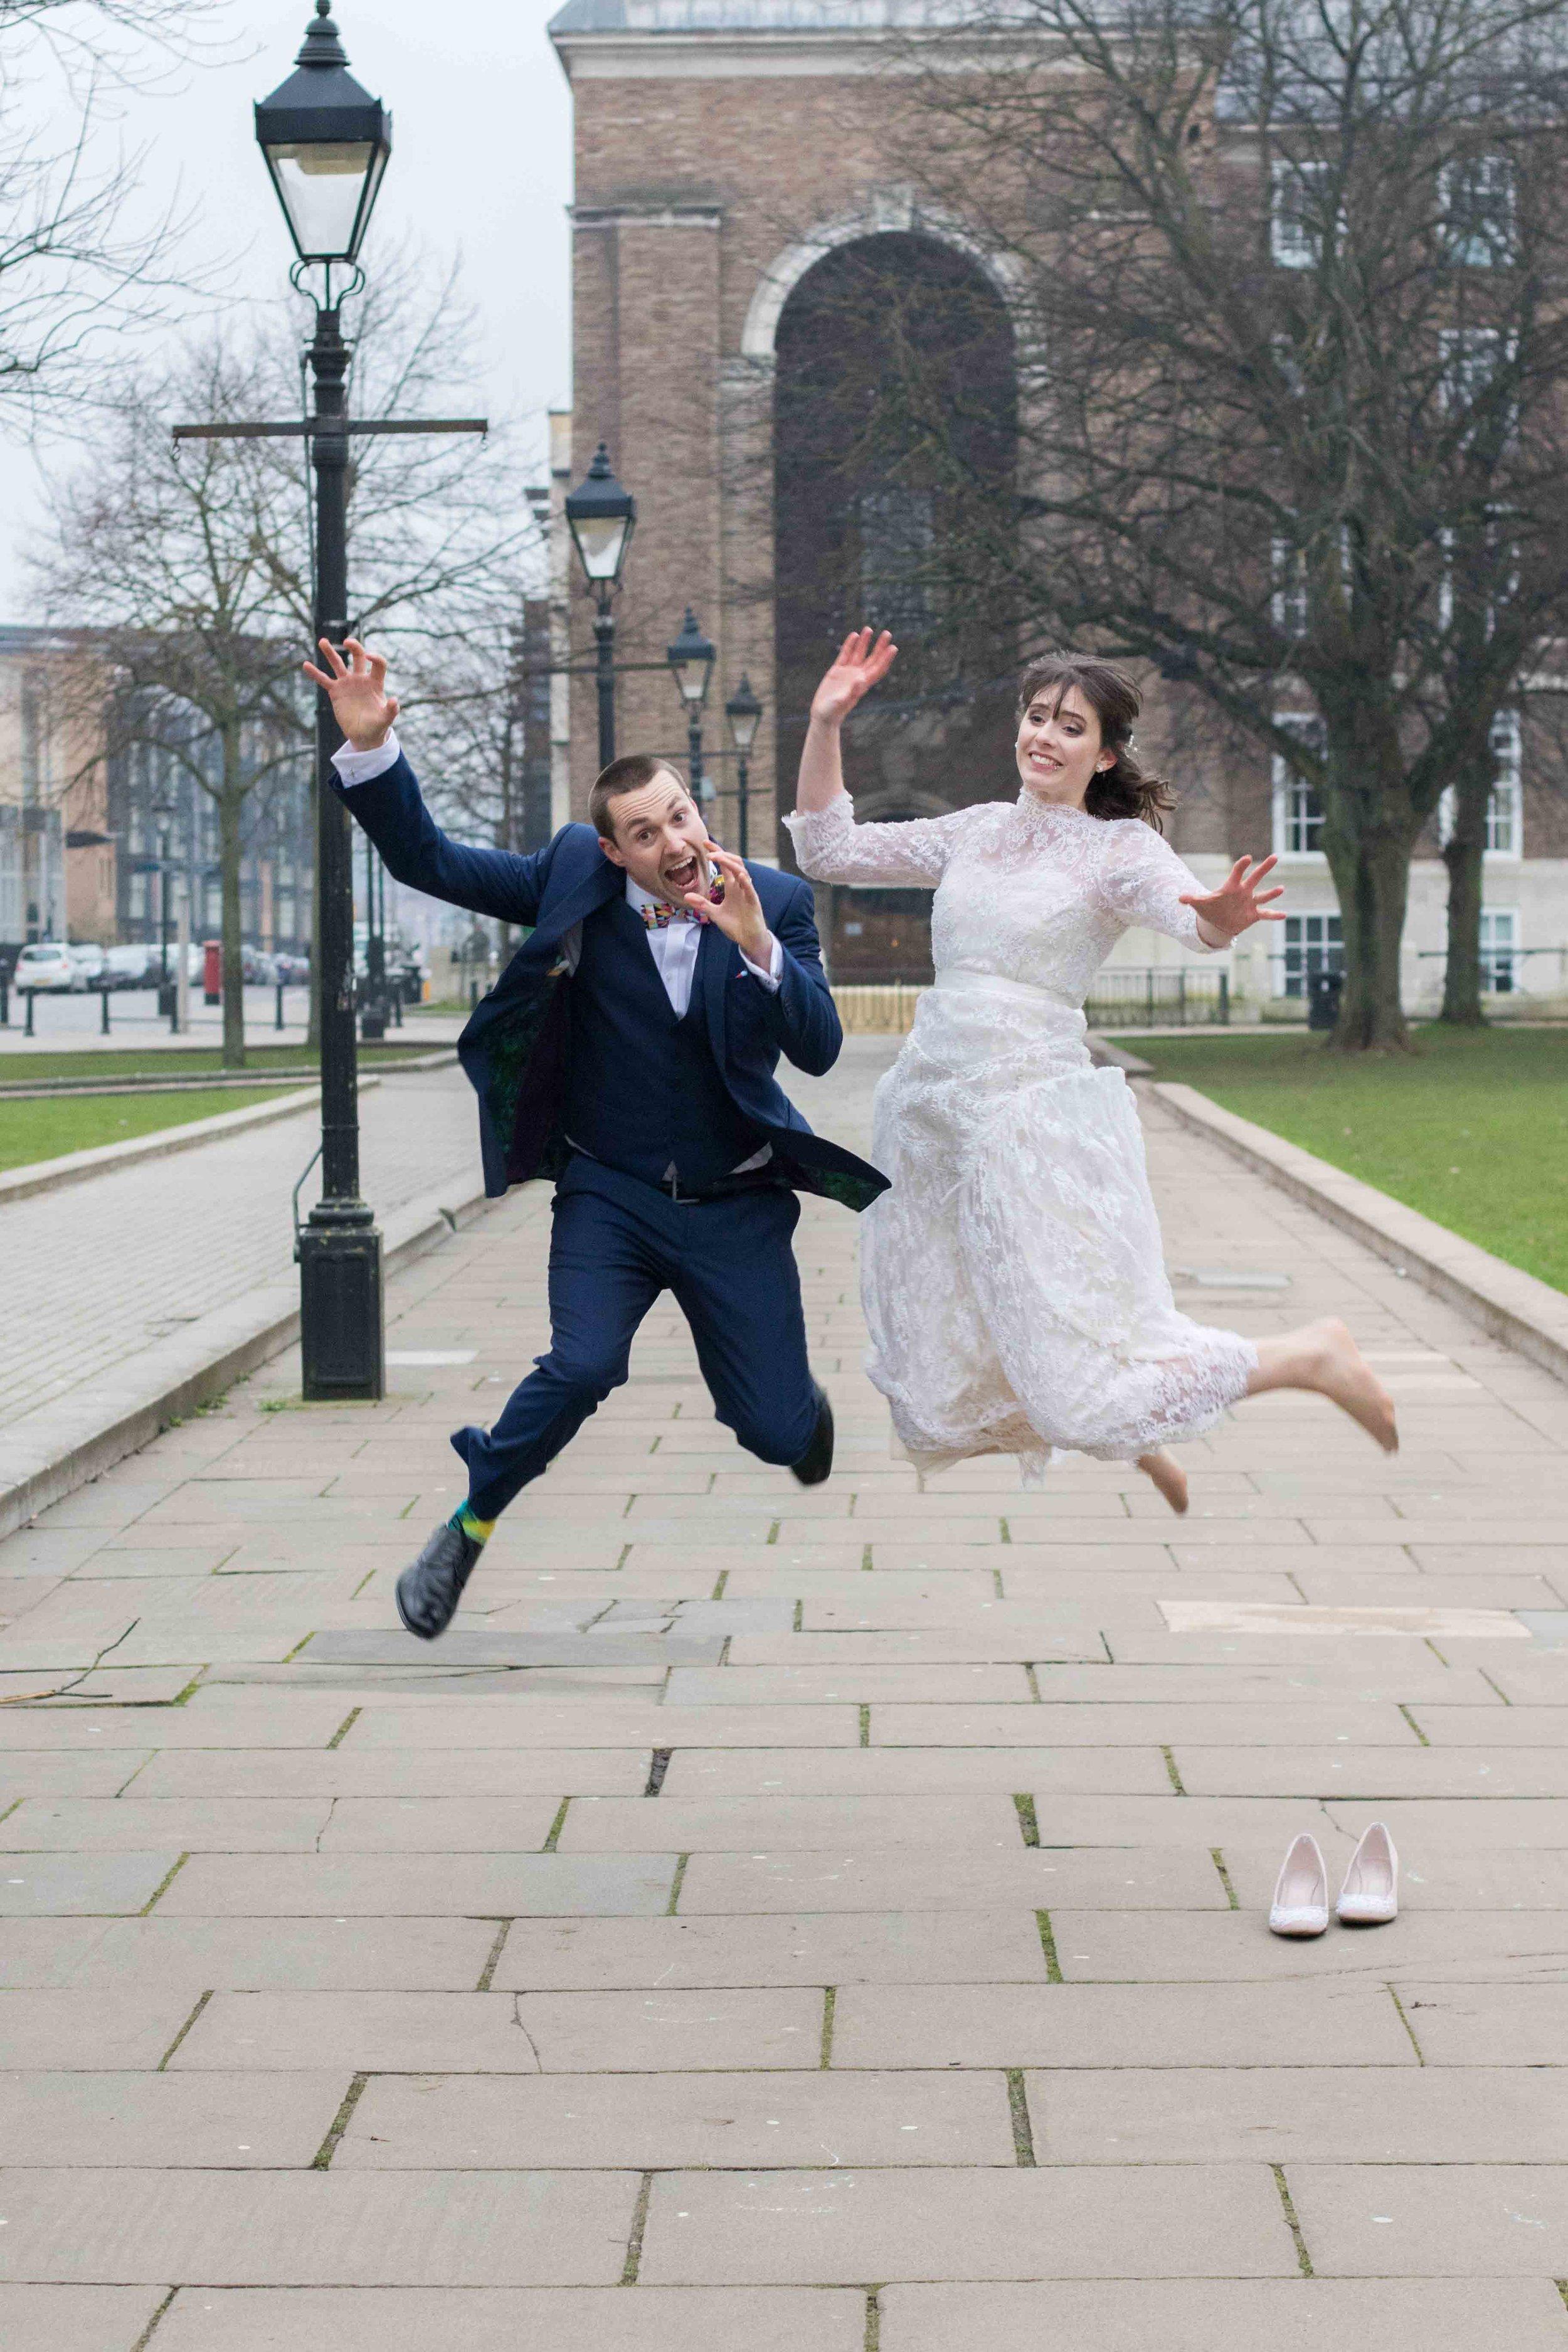 Adam & Faye - Wright Wedding Photography - Bristol Wedding Photographer -288.jpg